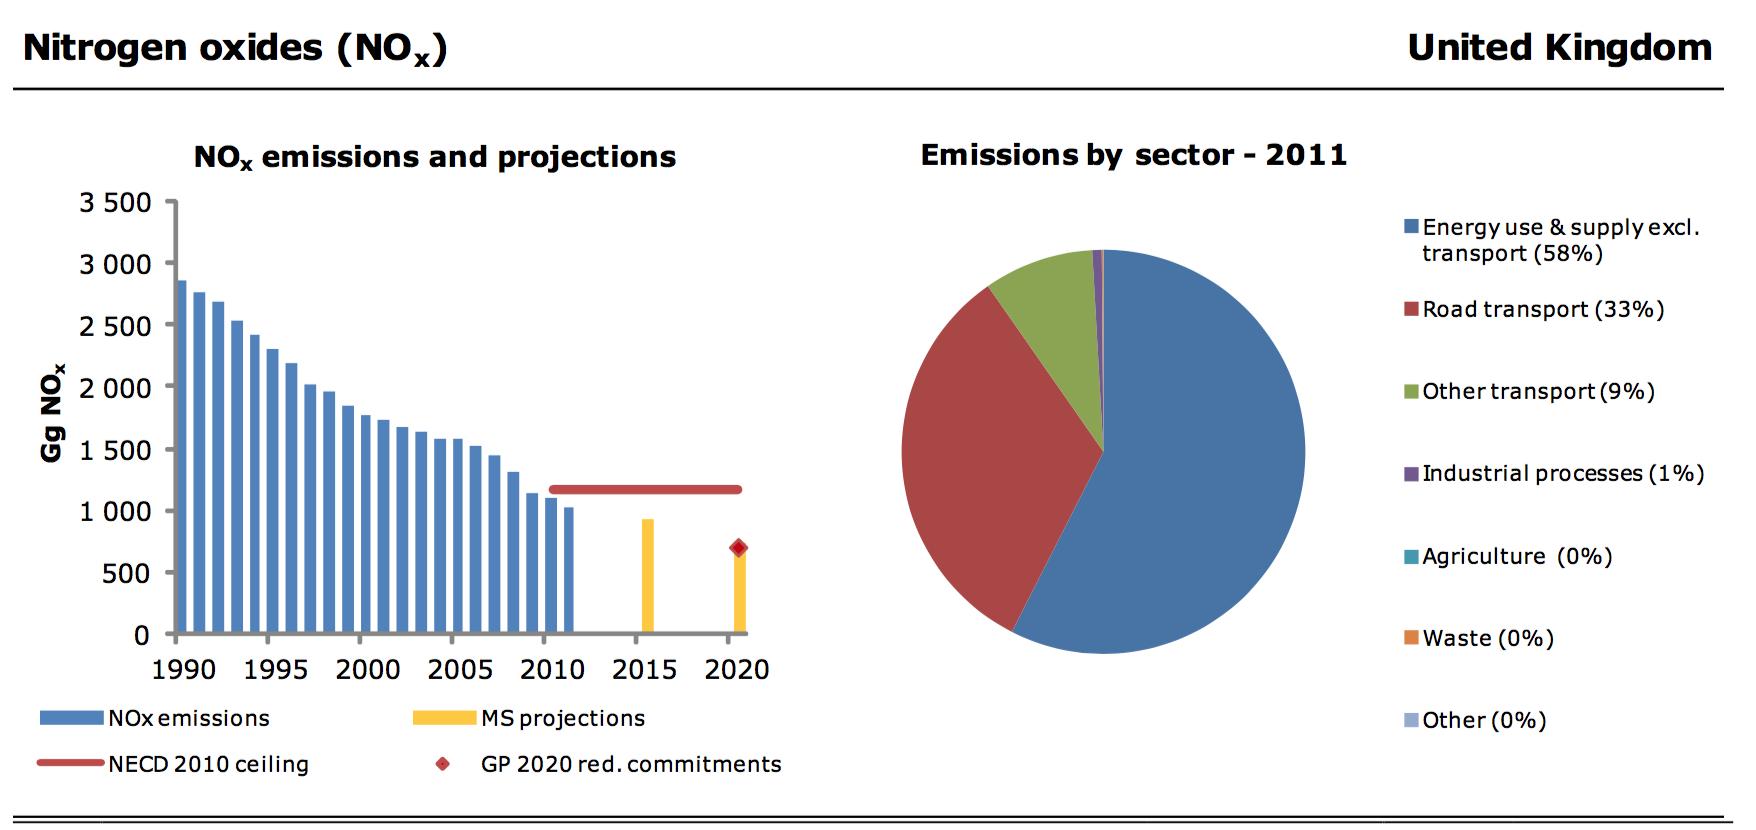 European Environment Agency - Air Pollution Fact Sheet 2013